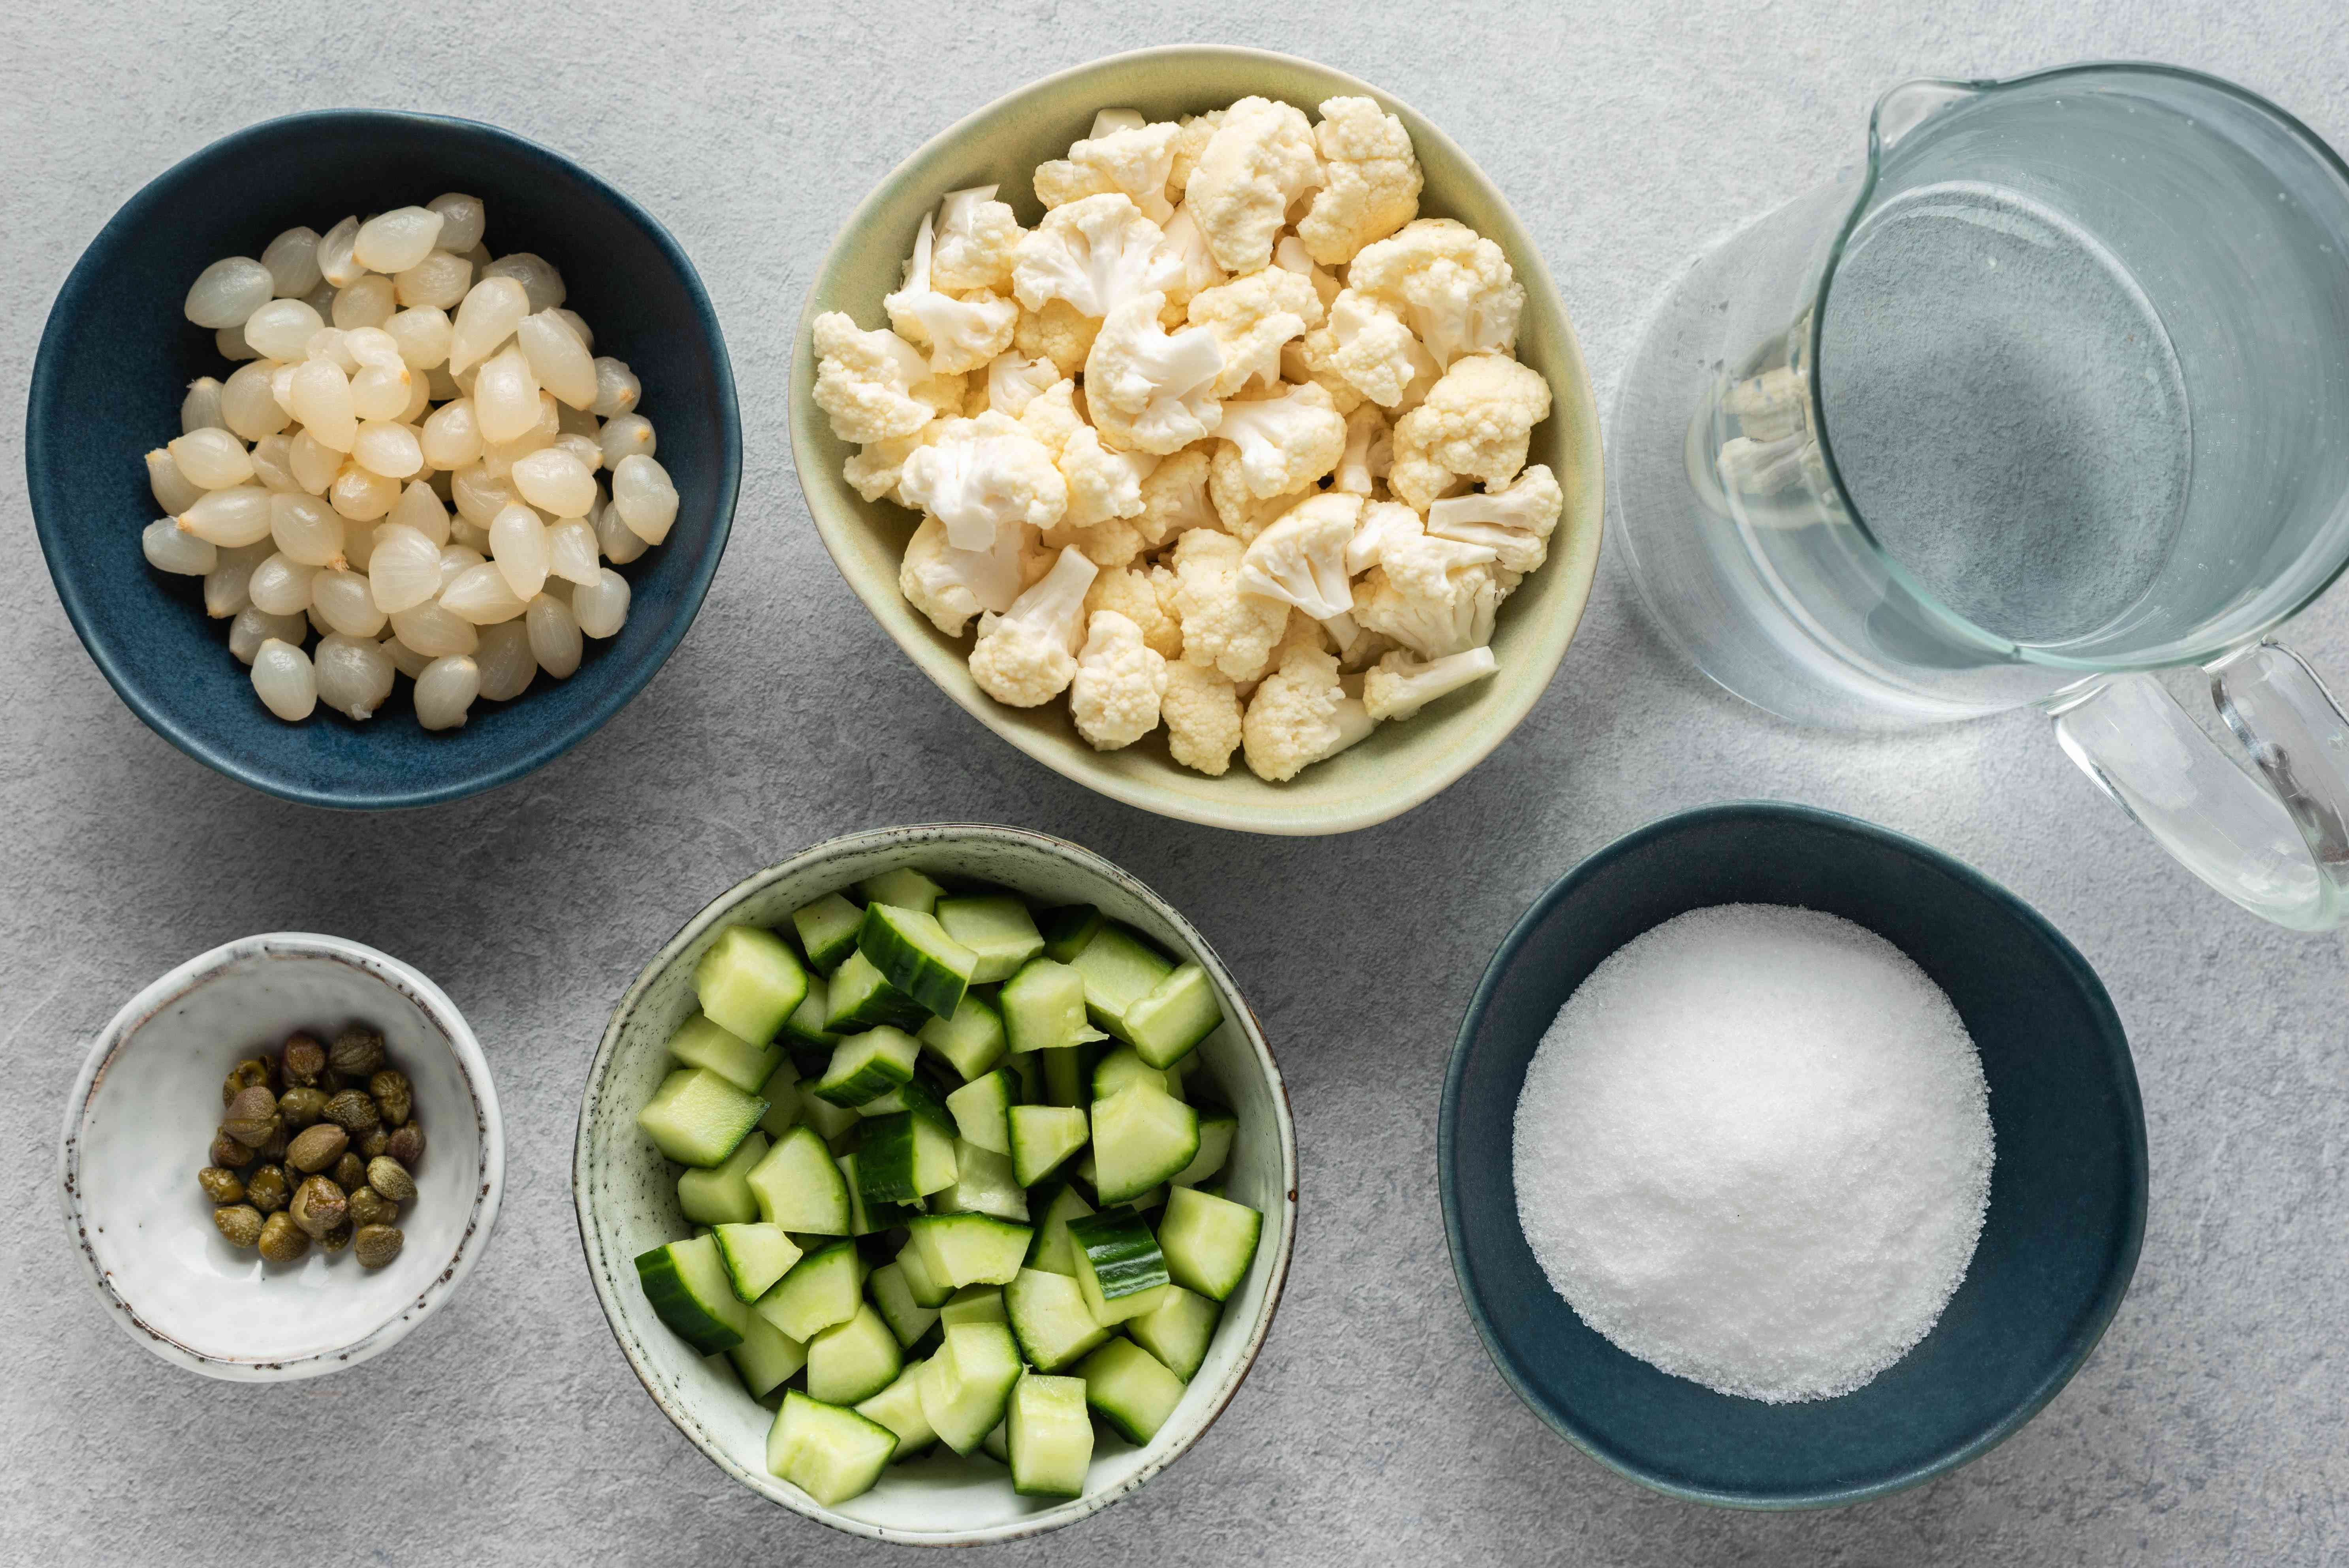 Classic piccalilli recipe brine ingredients